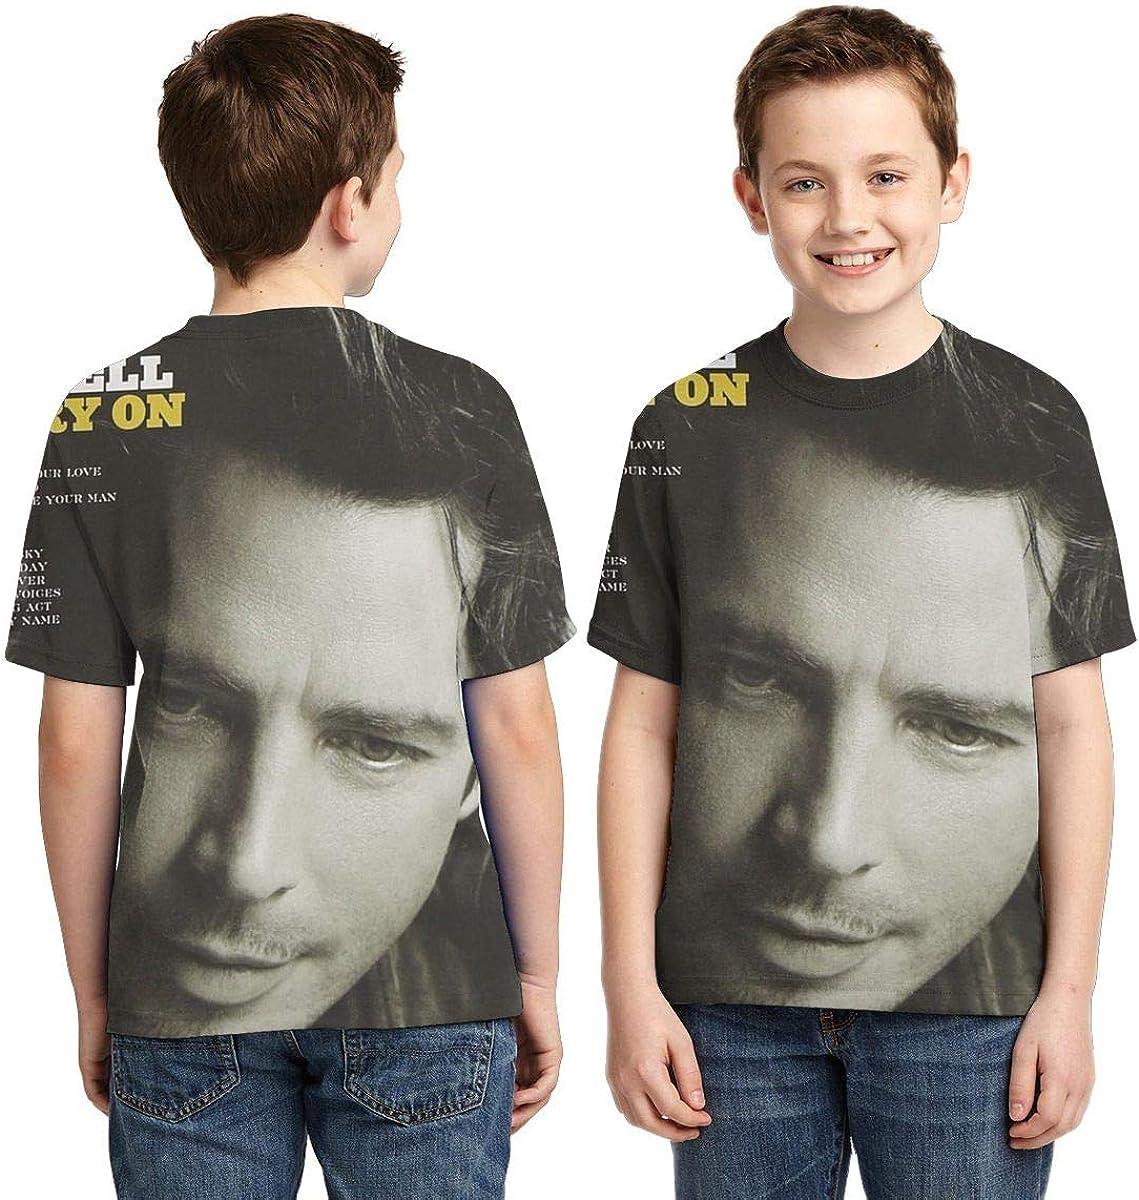 BowersJ Kids Chris Cornell Carry On Design 3D Printed Short Sleeve Tshirts for Girls /& Boys Black